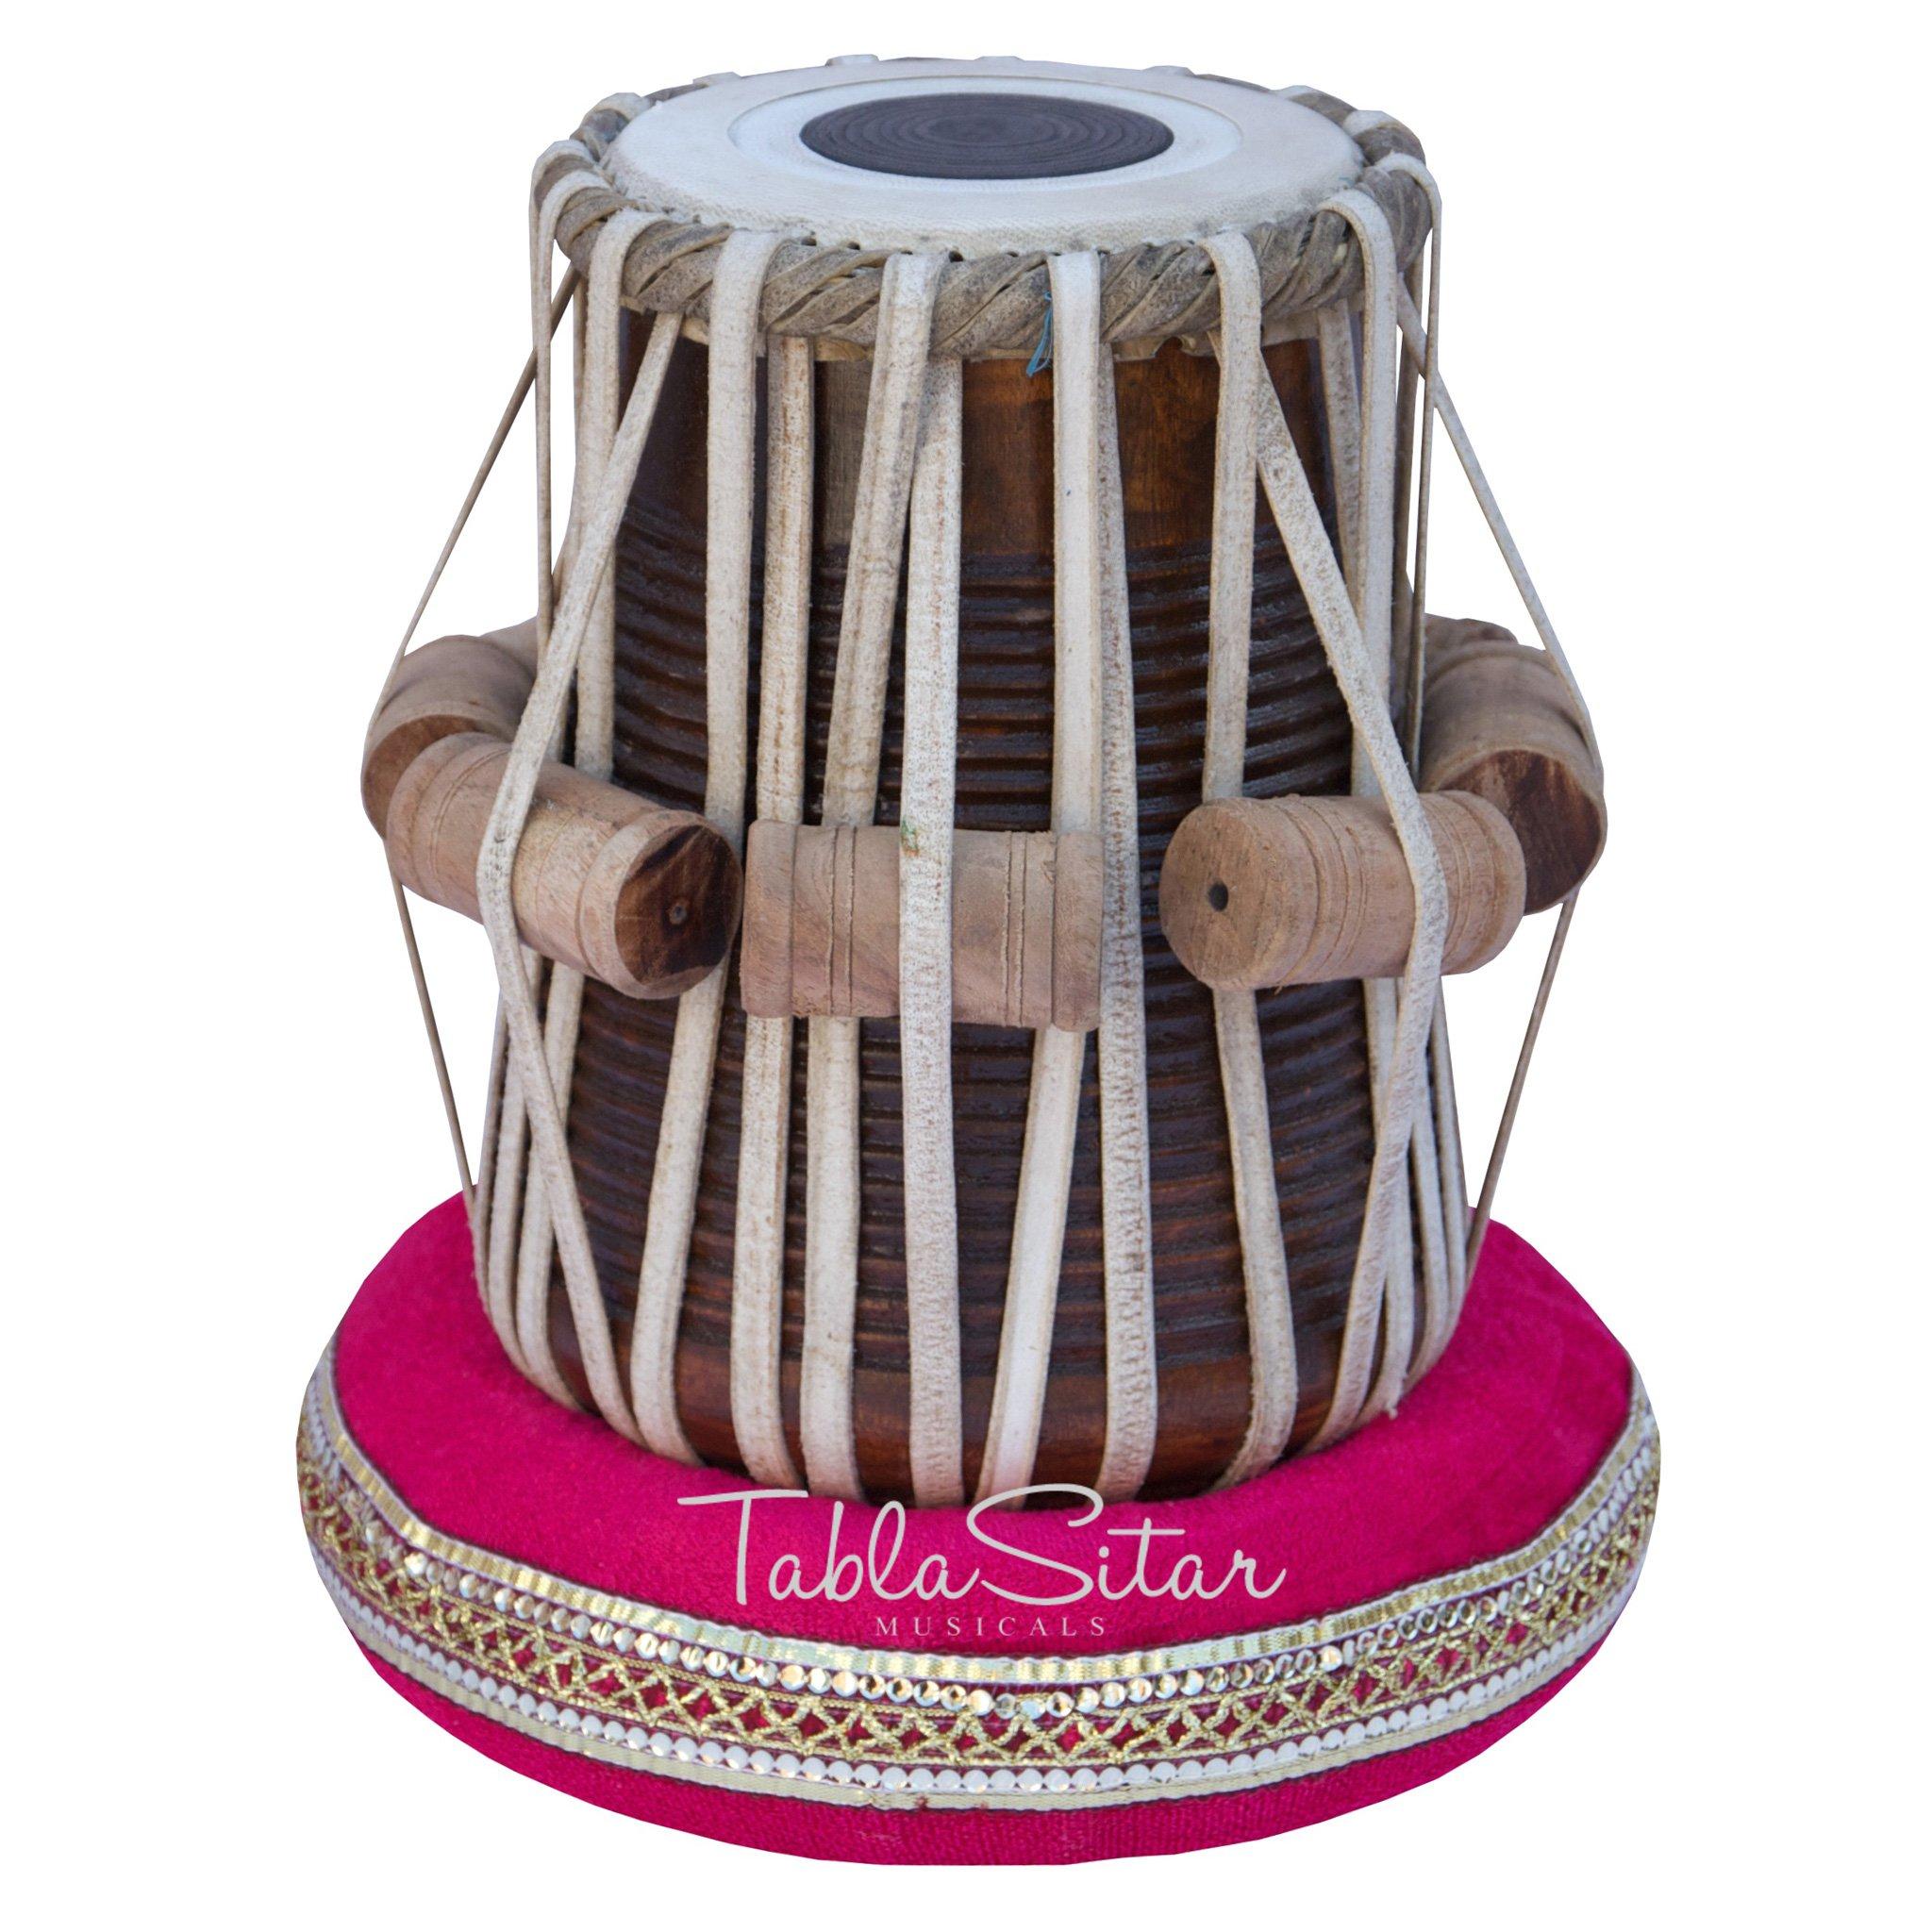 Tabla Drum Set by Maharaja Musicals, Professional, 3.5 Kg Copper Bayan - Designer Carving, Sheesham Tabla Dayan, Padded Bag, Book, Hammer, Cushions, Cover, Tabla Musical Instrument (PDI-CJH) by Maharaja Musicals (Image #4)